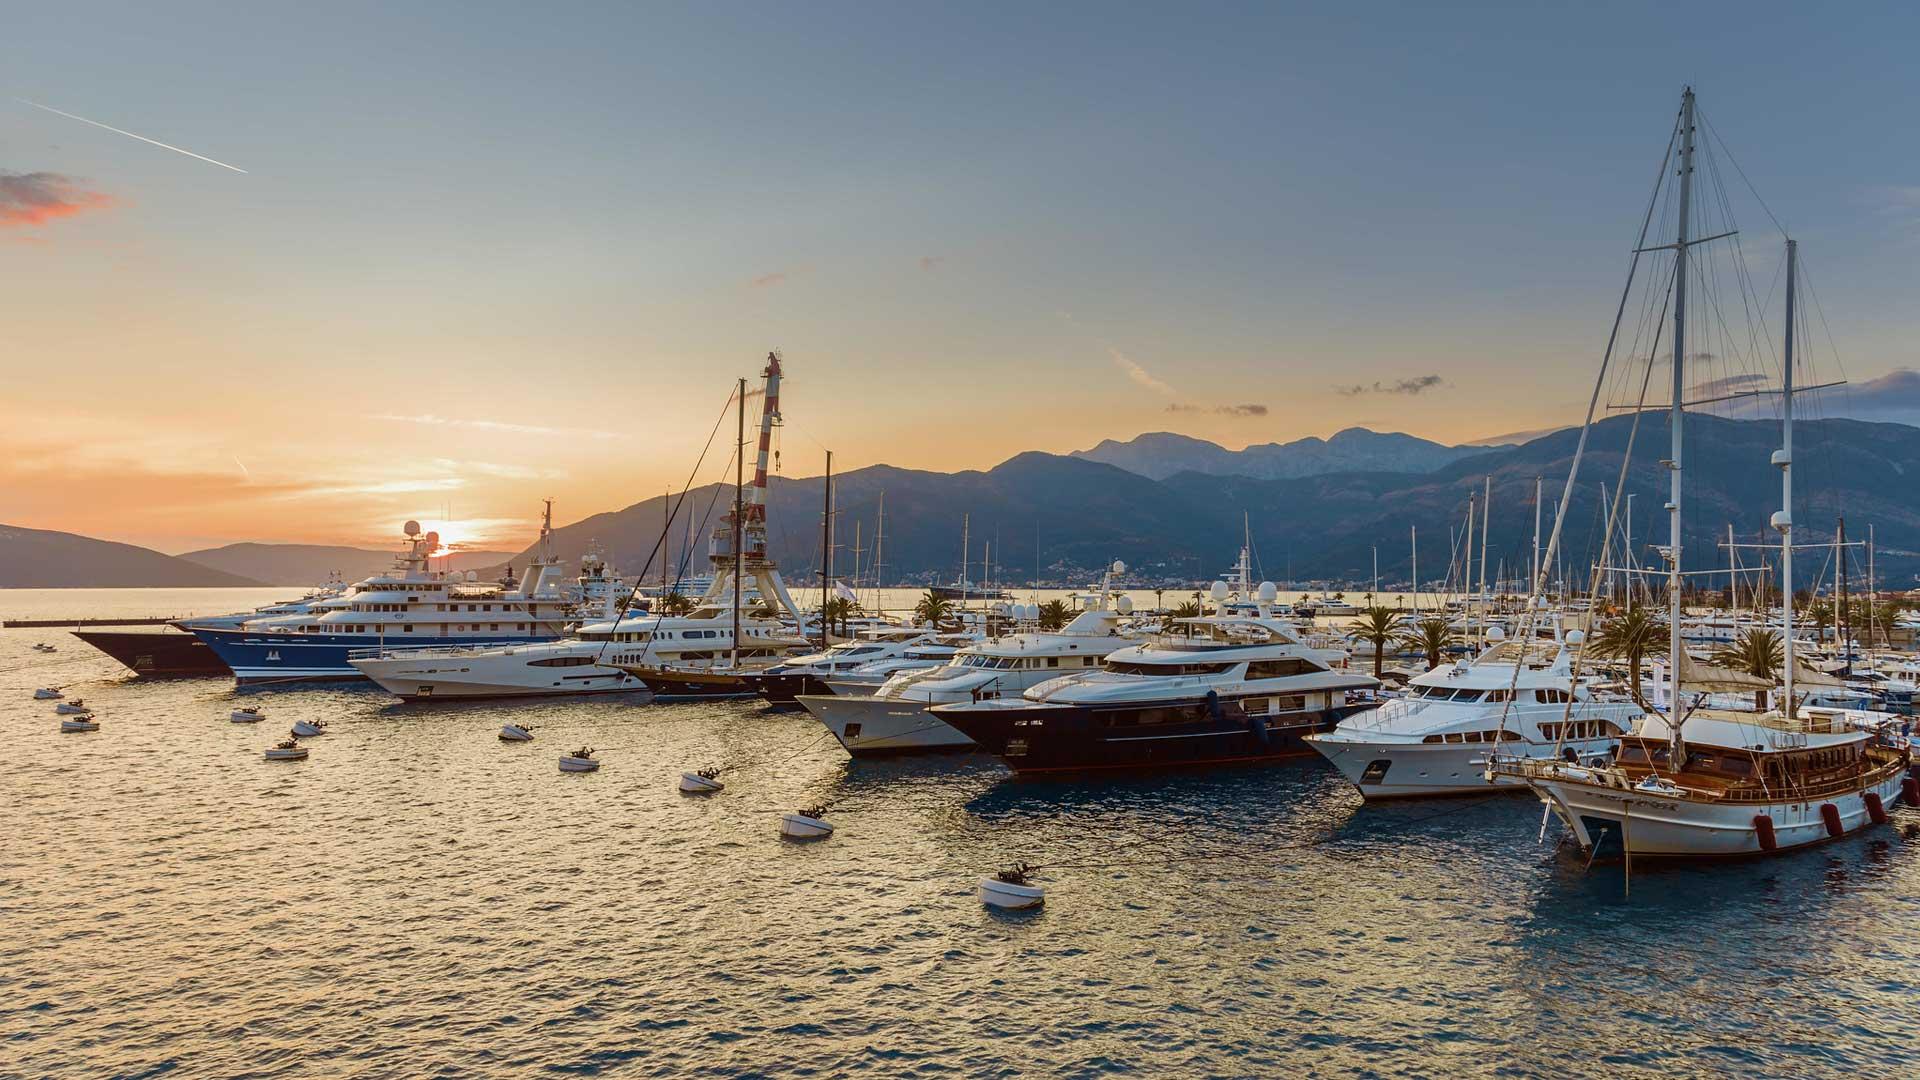 Porto Montenegro marina at dusk